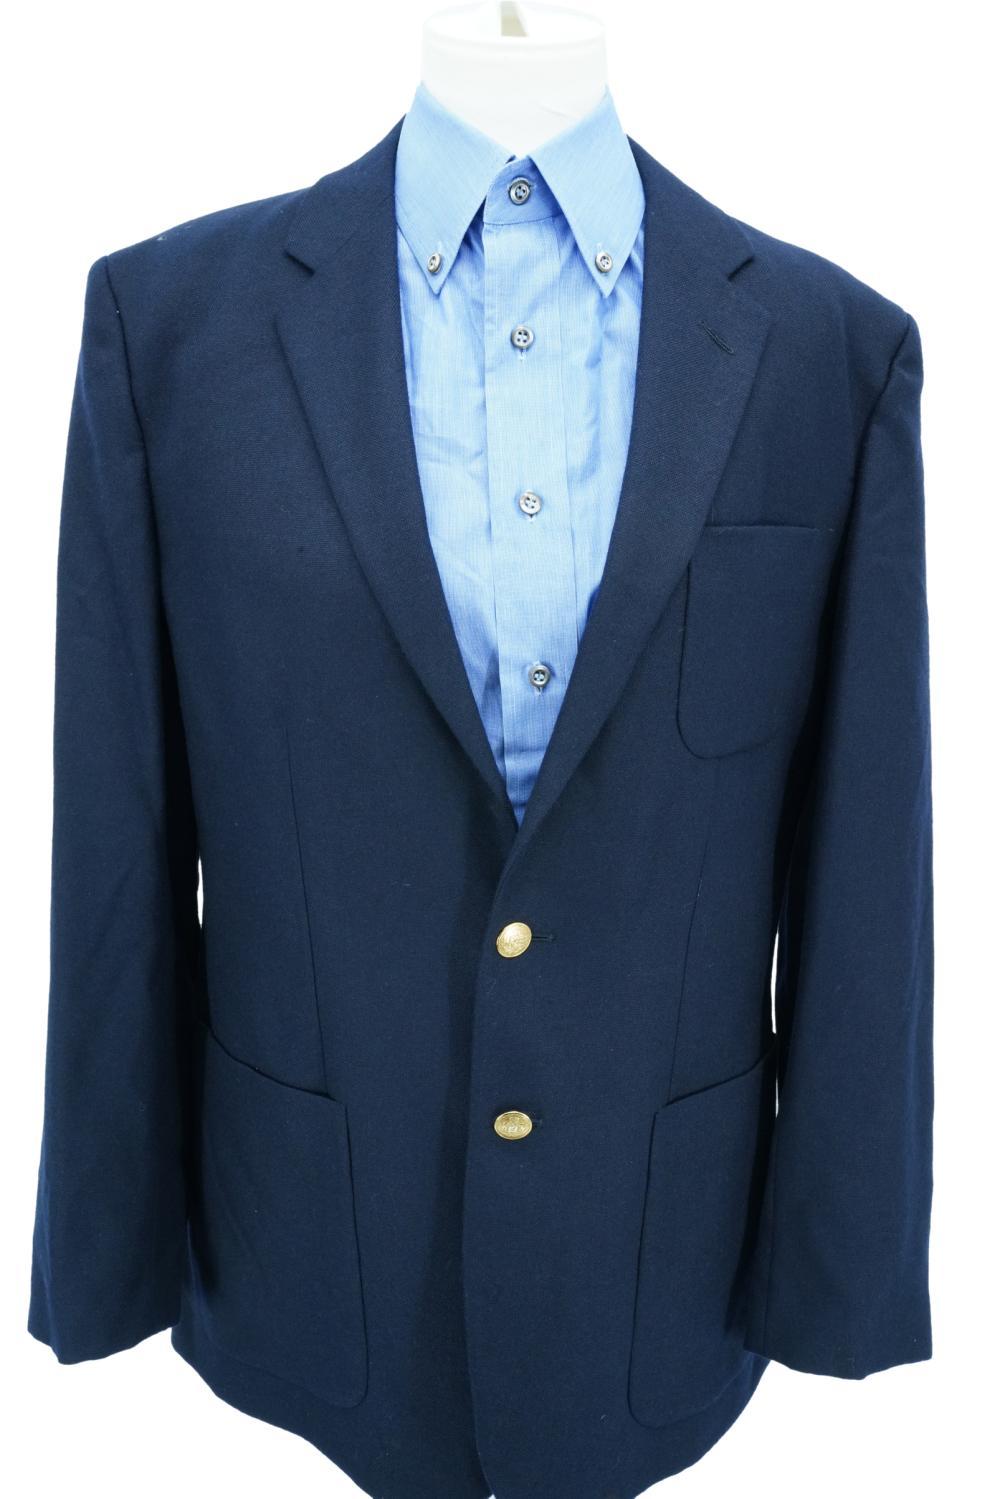 Sold Price Along Came Polly 2004 Ben Stiller S Shirt Jacket August 6 0120 10 00 Am Pdt